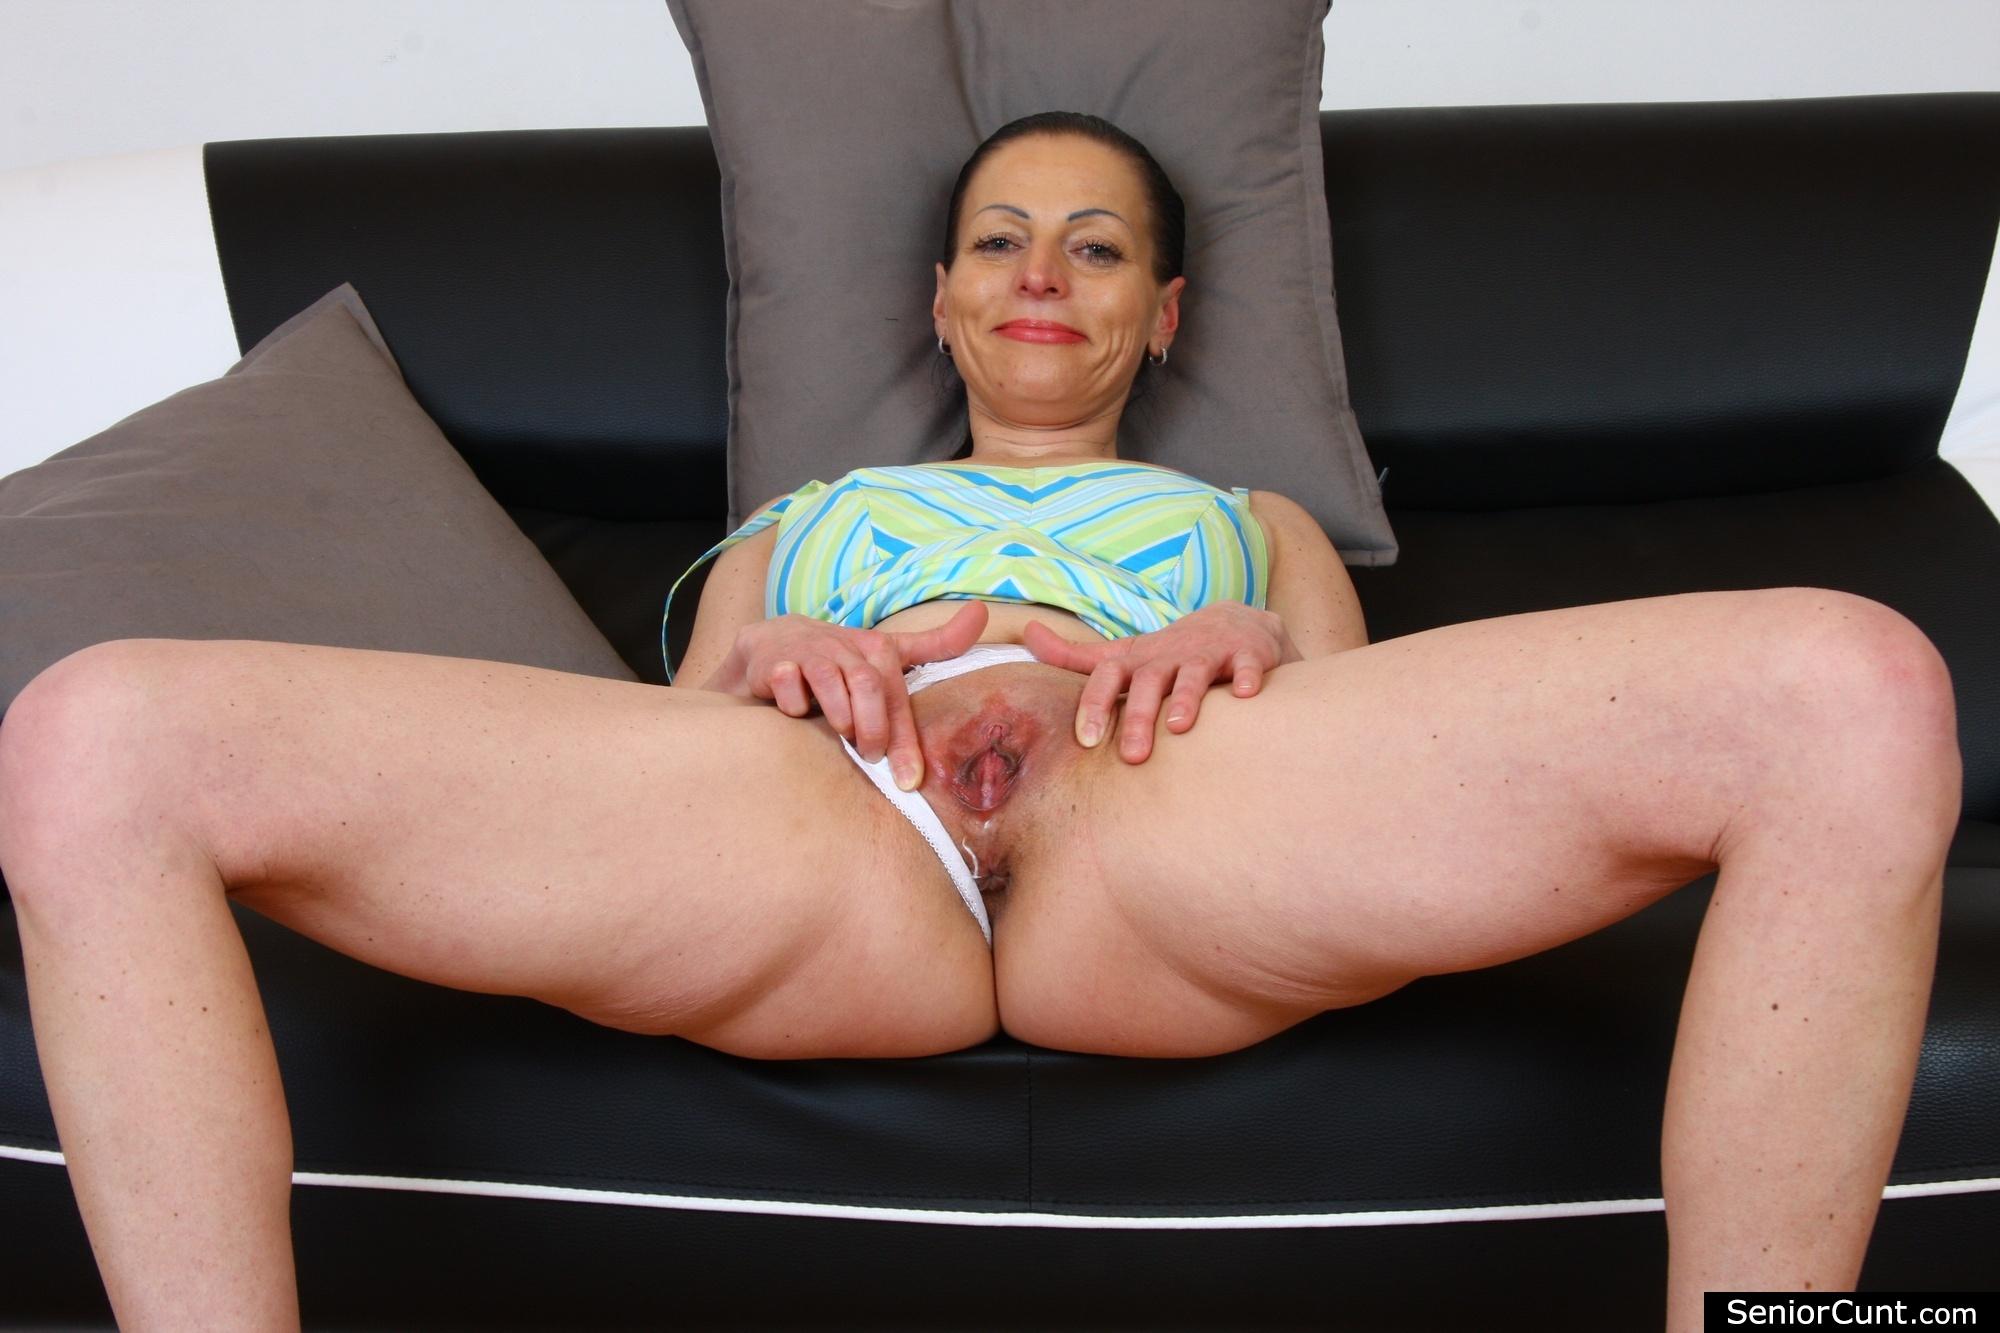 Older women pussy pics